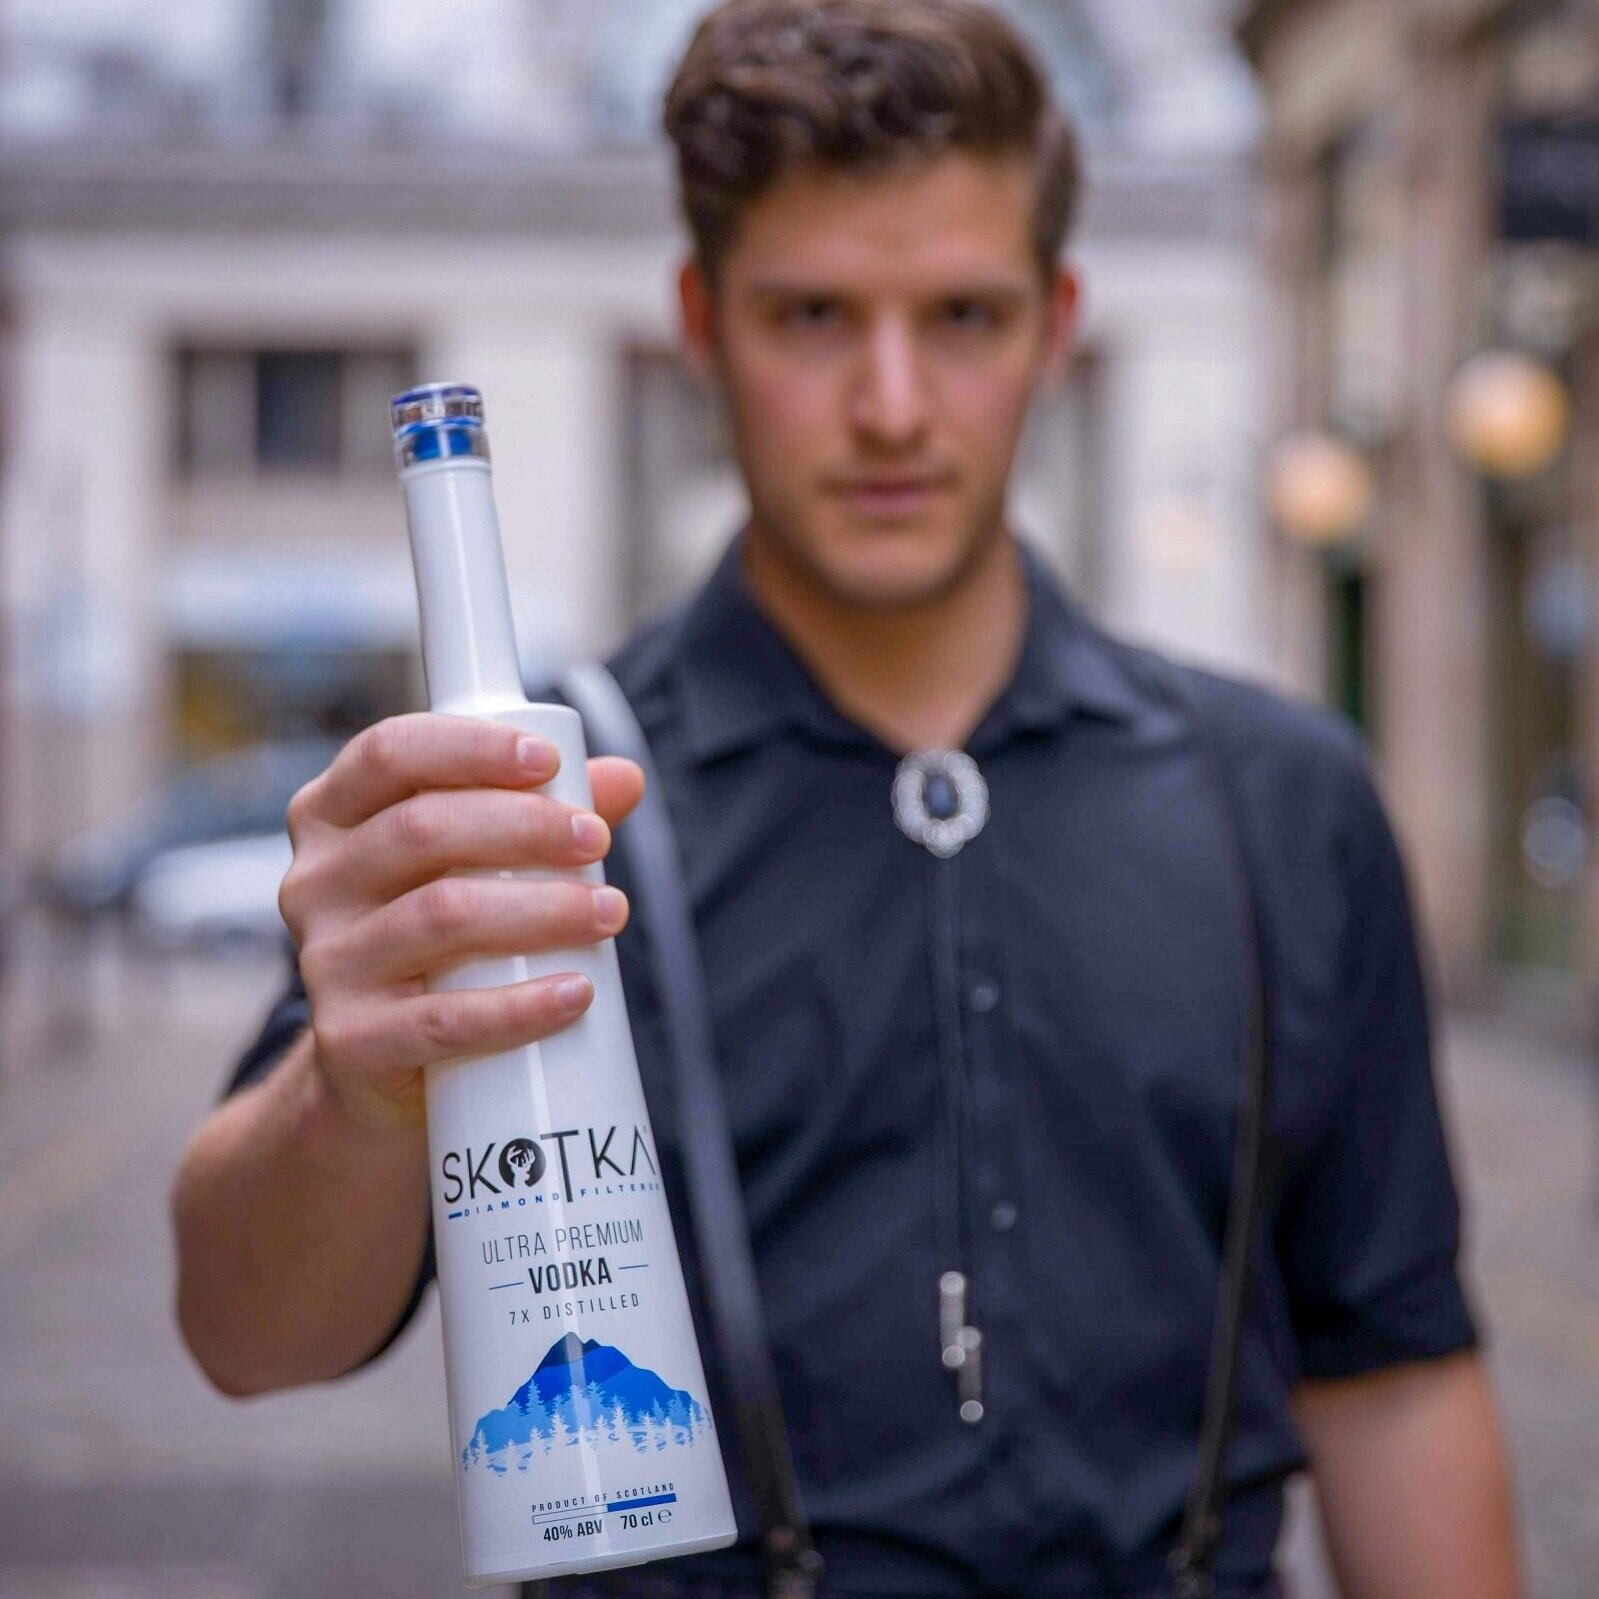 Lady wearing blue dress leaning on bar with bottle of SKOTKA Vodka on the bar